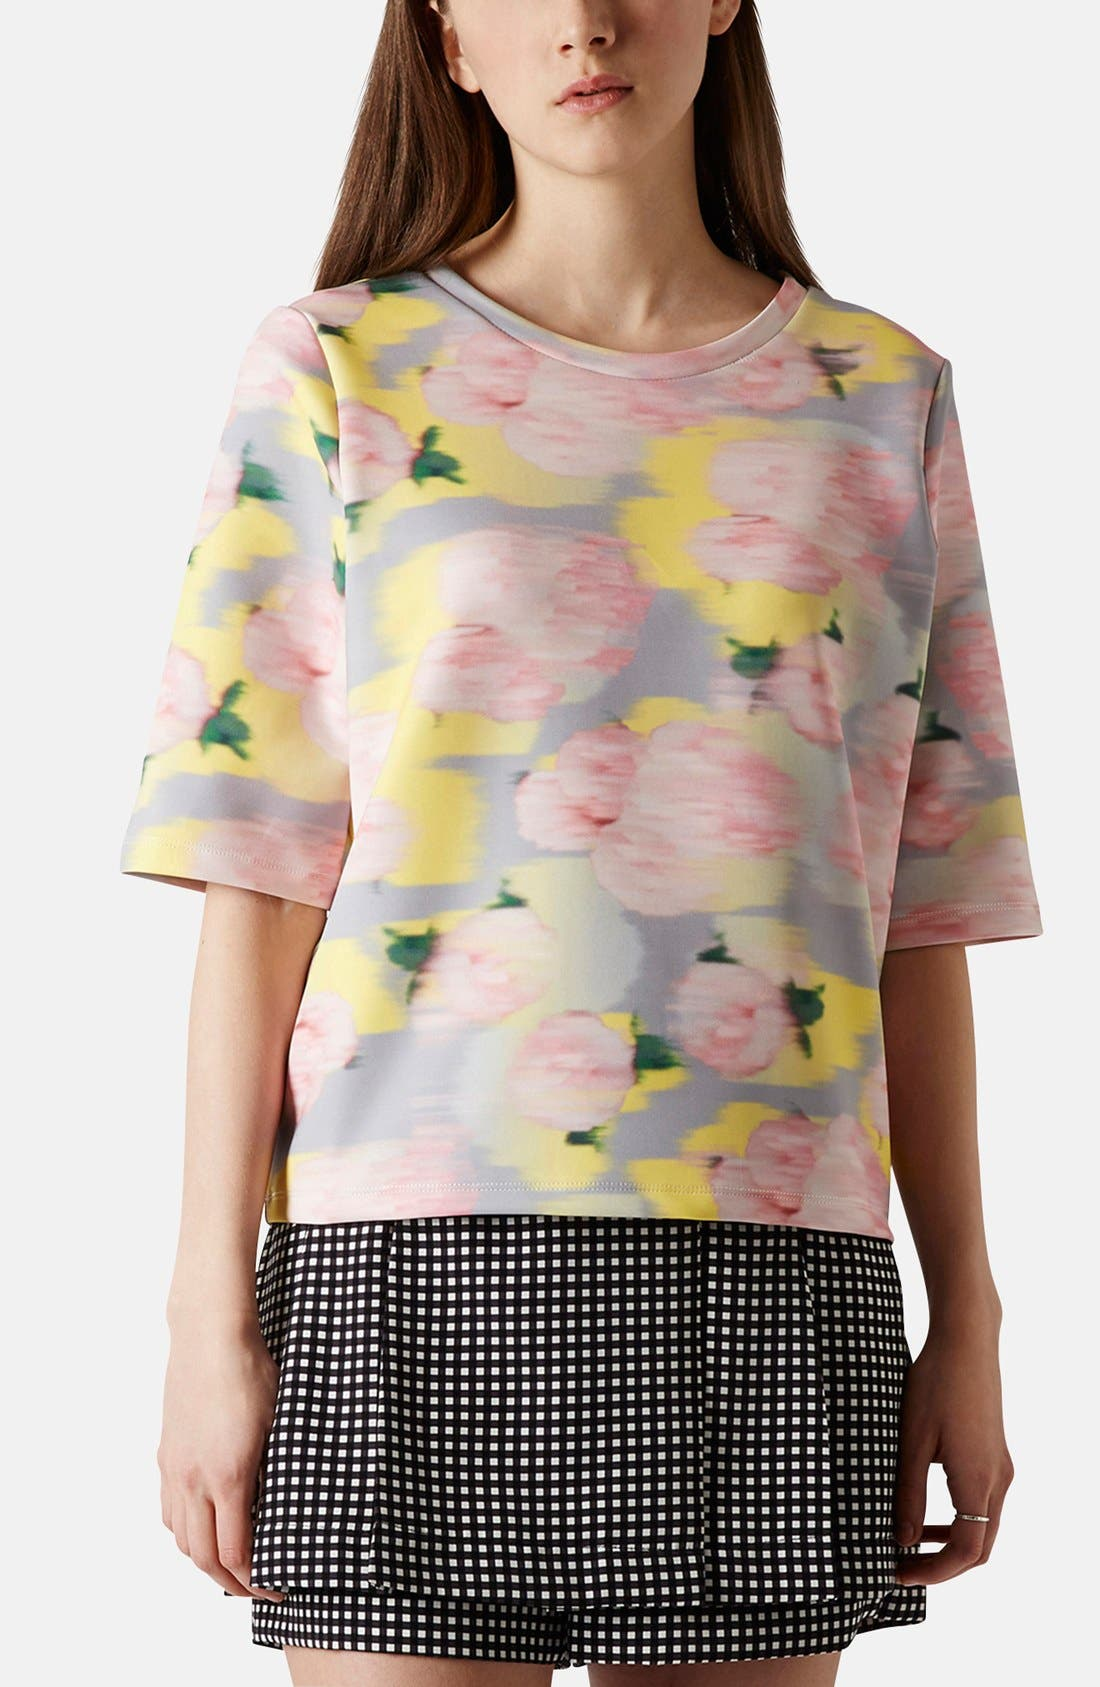 Alternate Image 1 Selected - Topshop 'Blurred Floral' Print Scuba Top